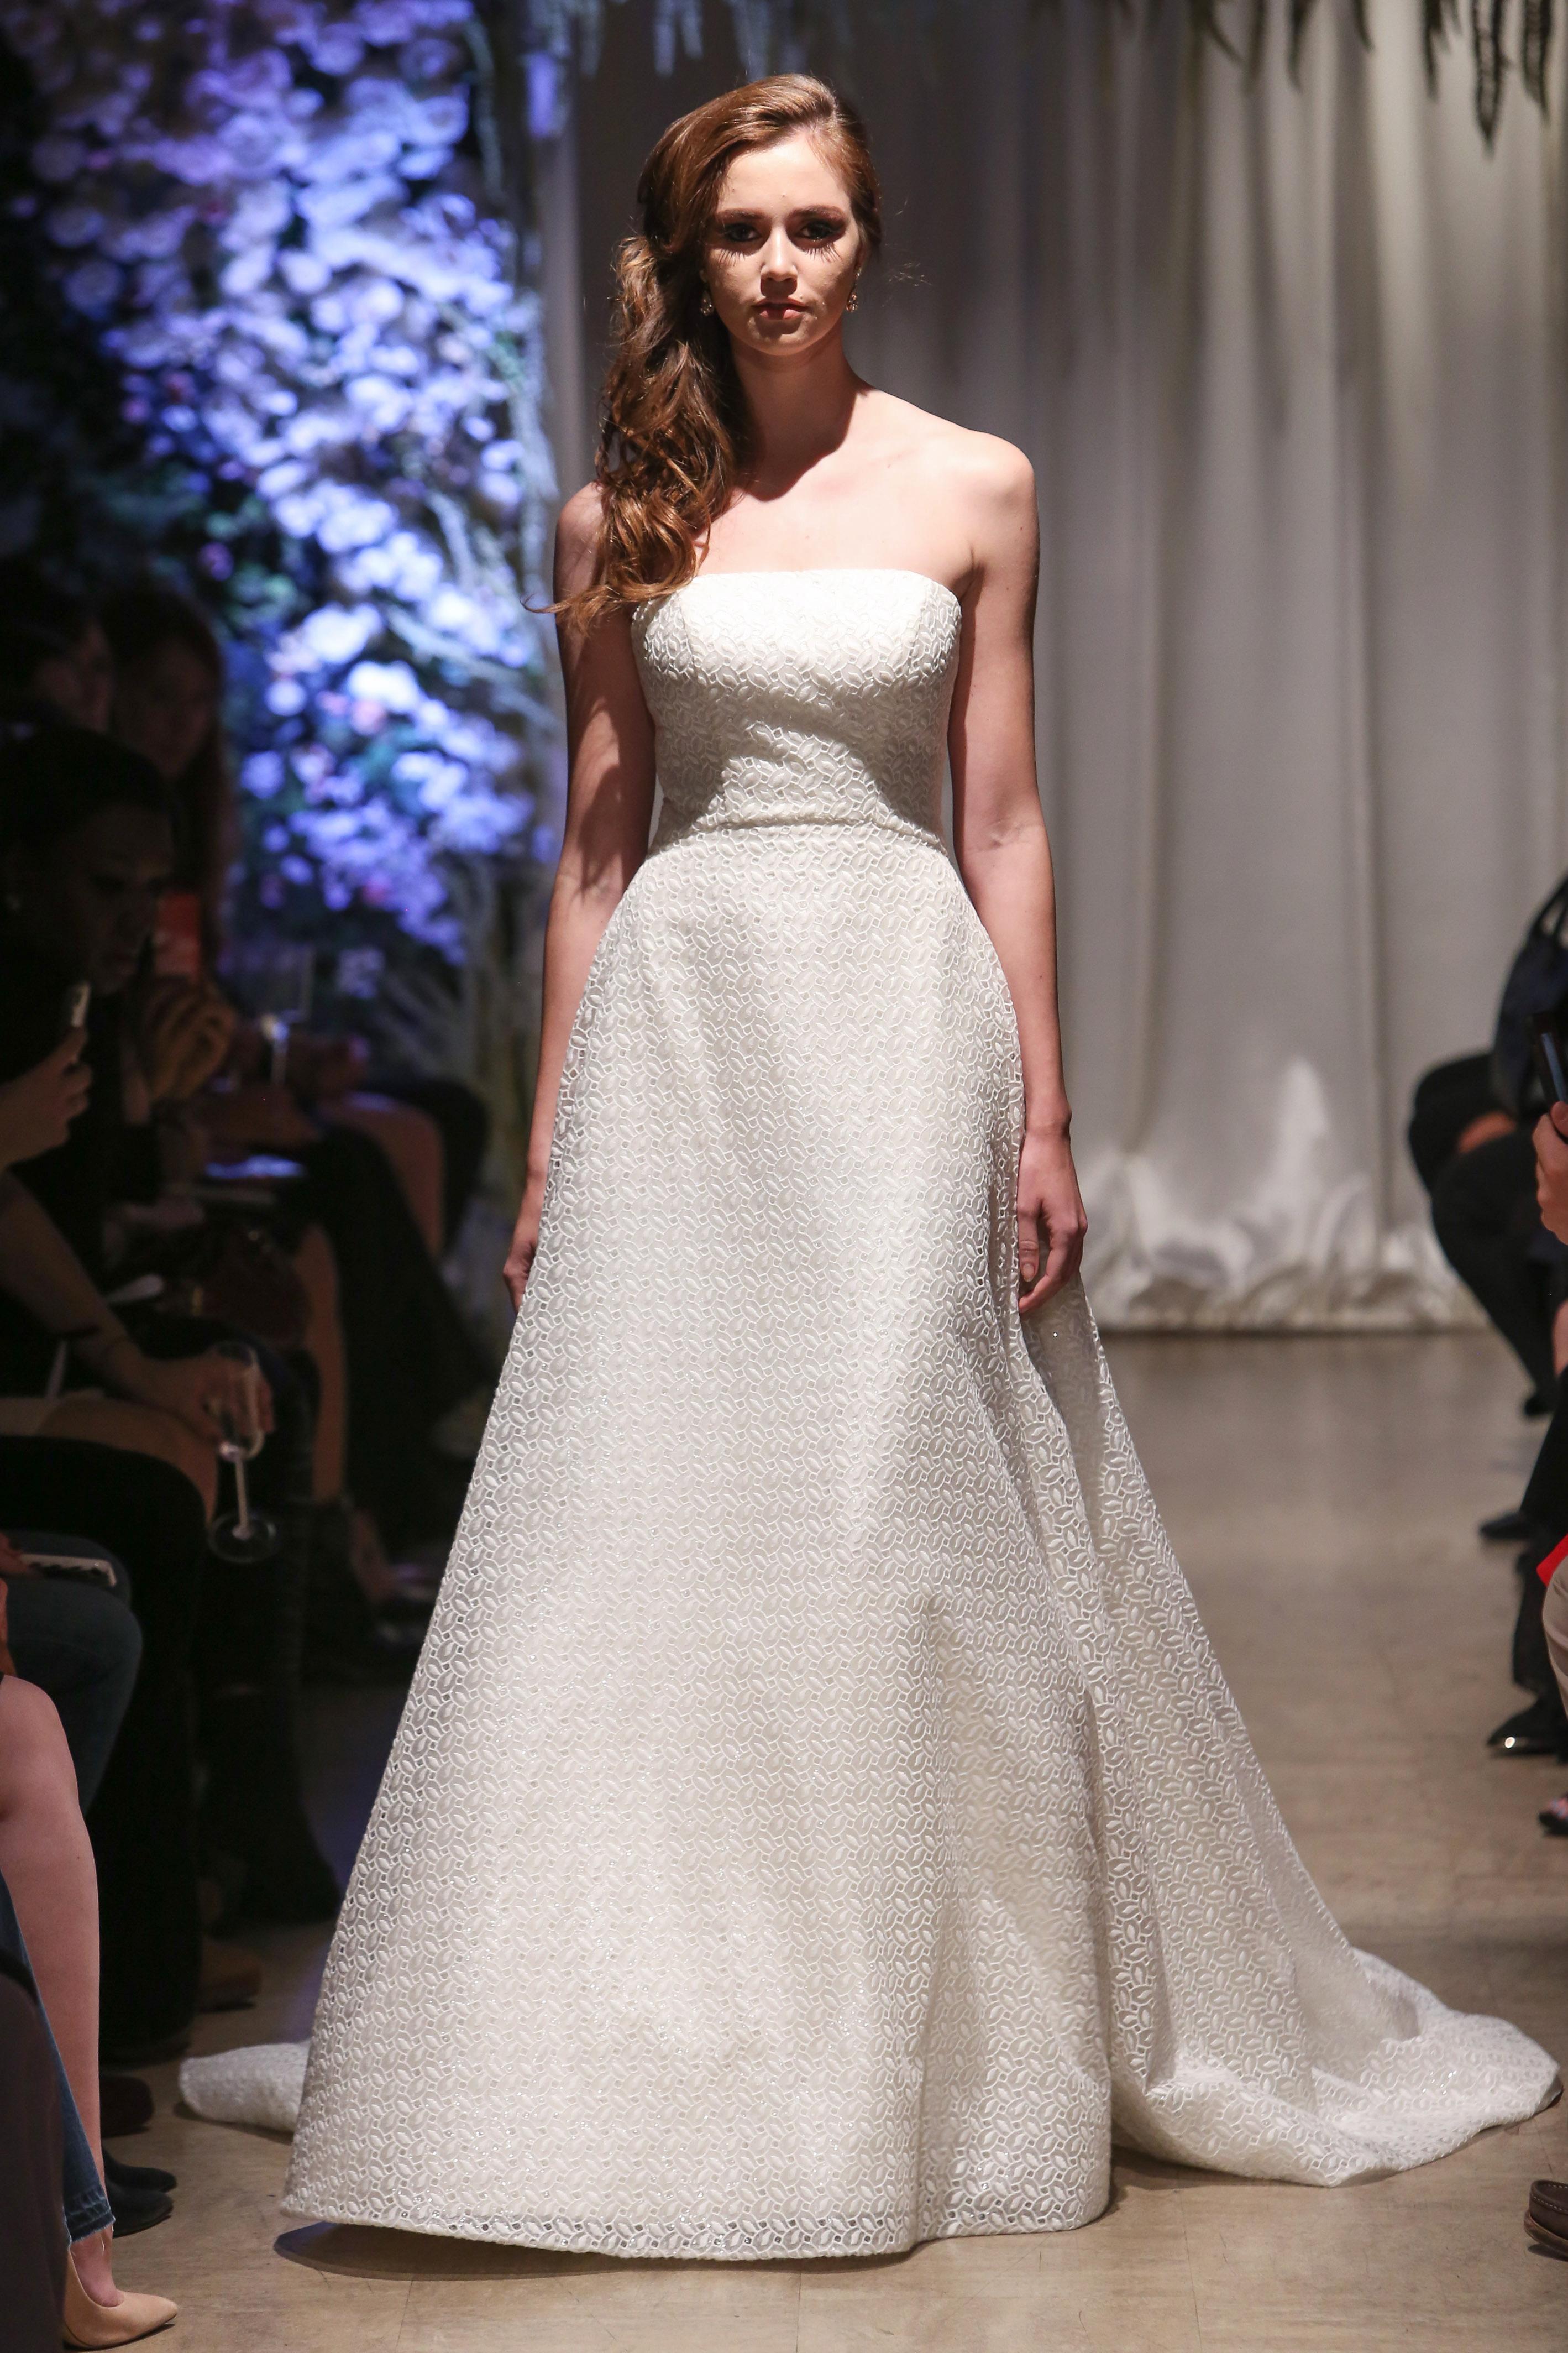 matthew christopher 2018 a-line patterned wedding dress